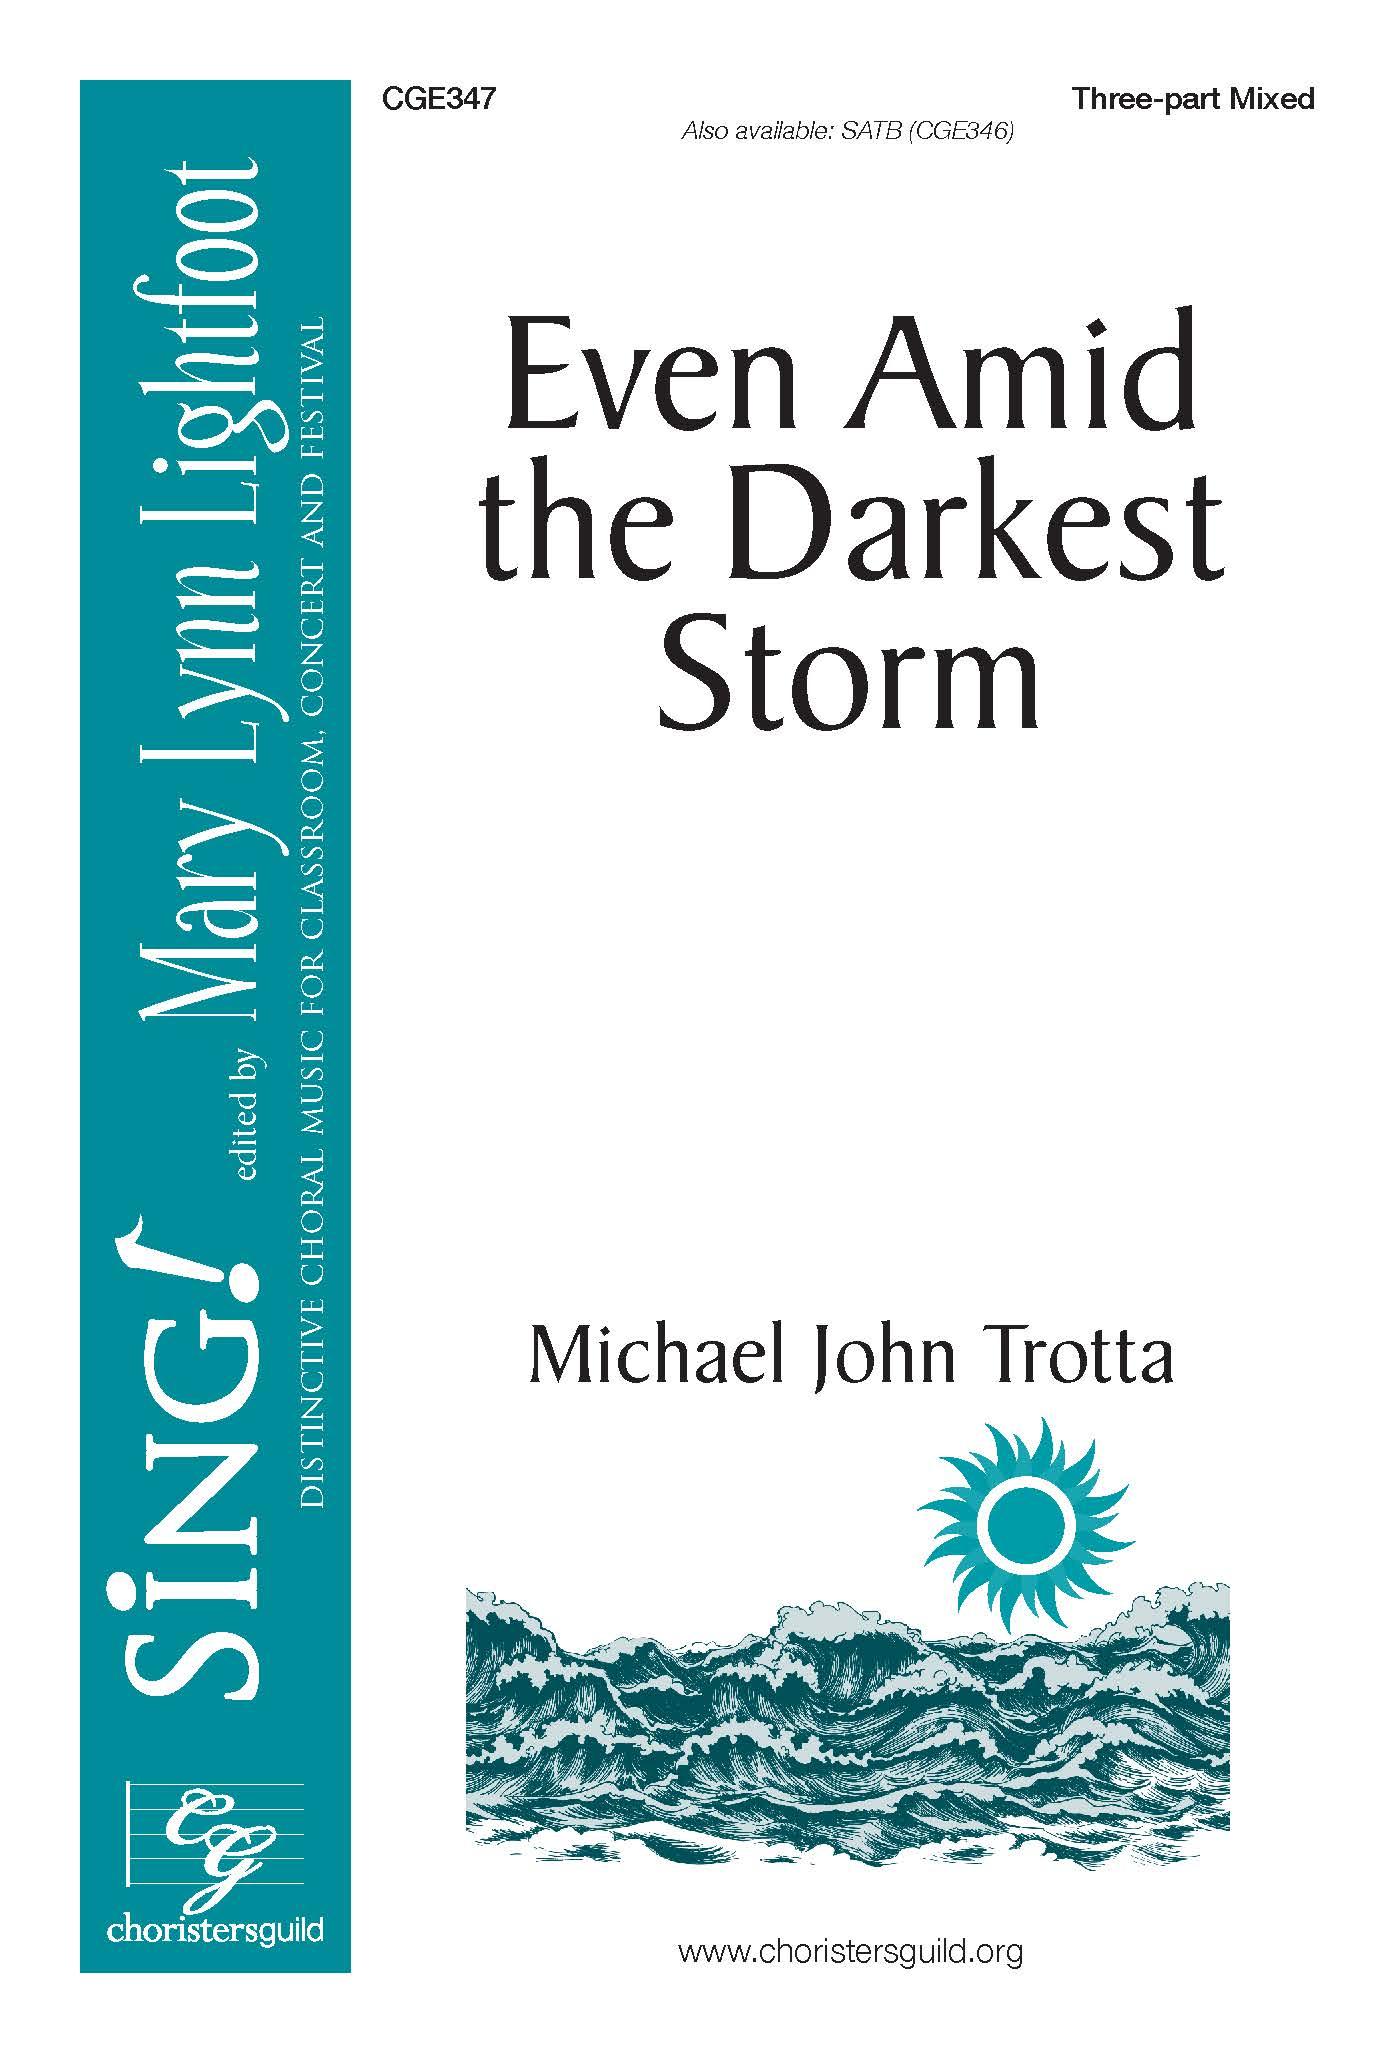 Even Amid the Darkest Storm - Three-part Mixed